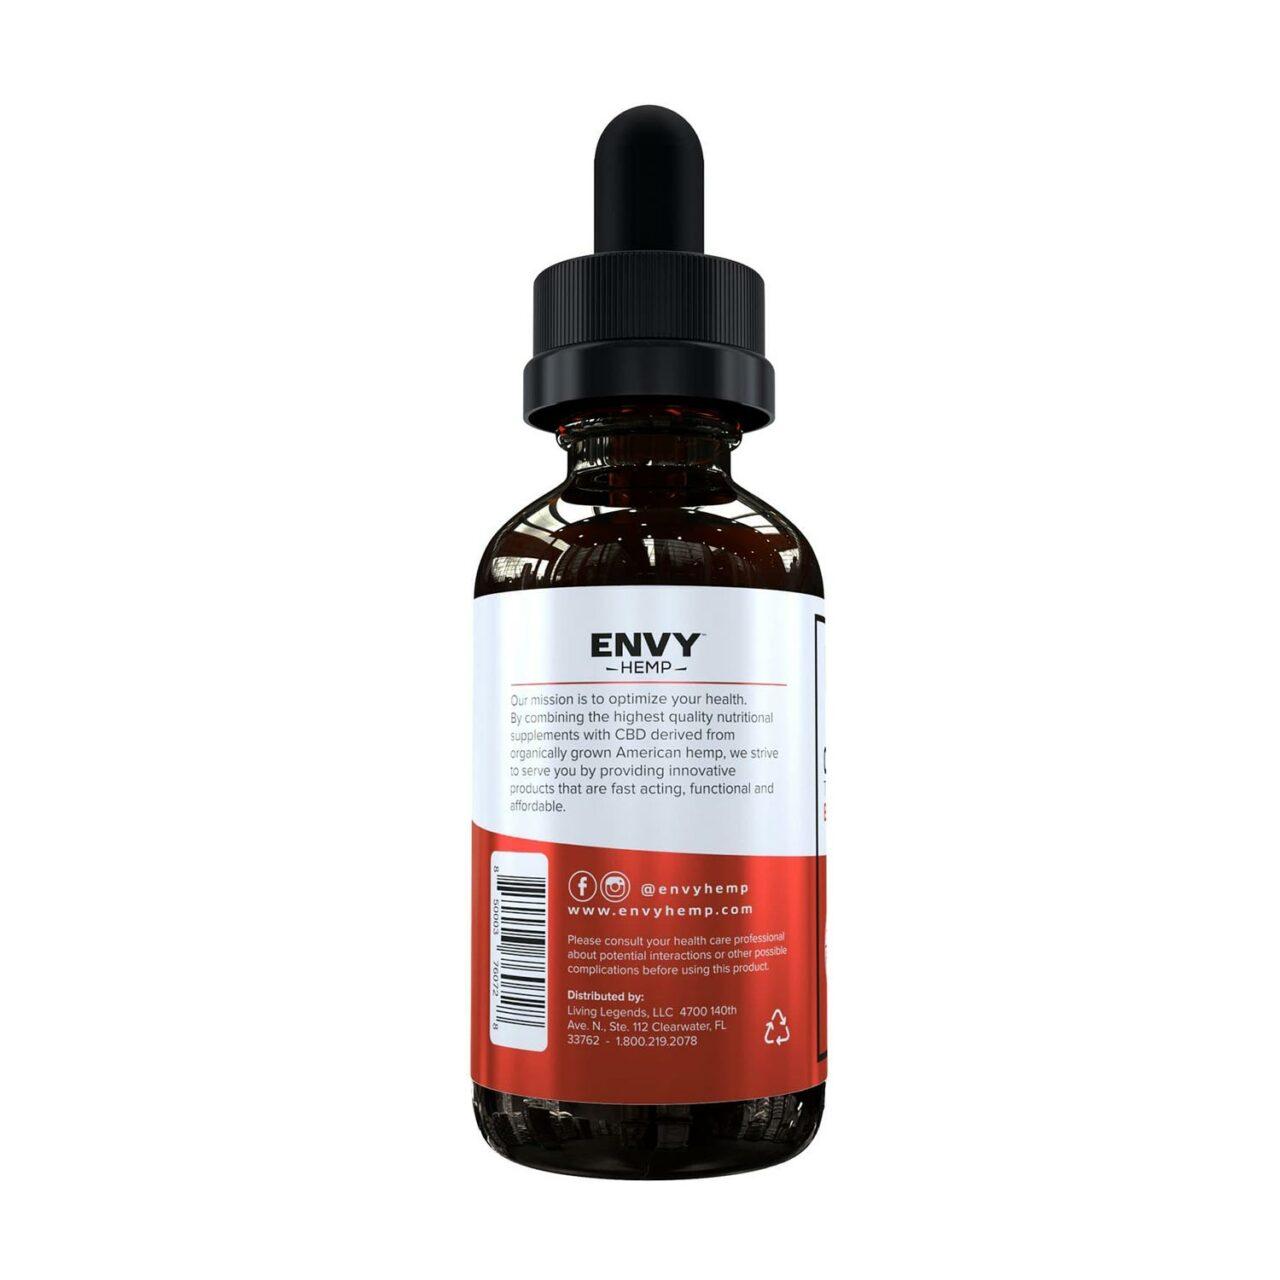 envy-hemp-cbd-oil-tincture-for-energy-with-caffeine-2oz-250mg-of-cbd